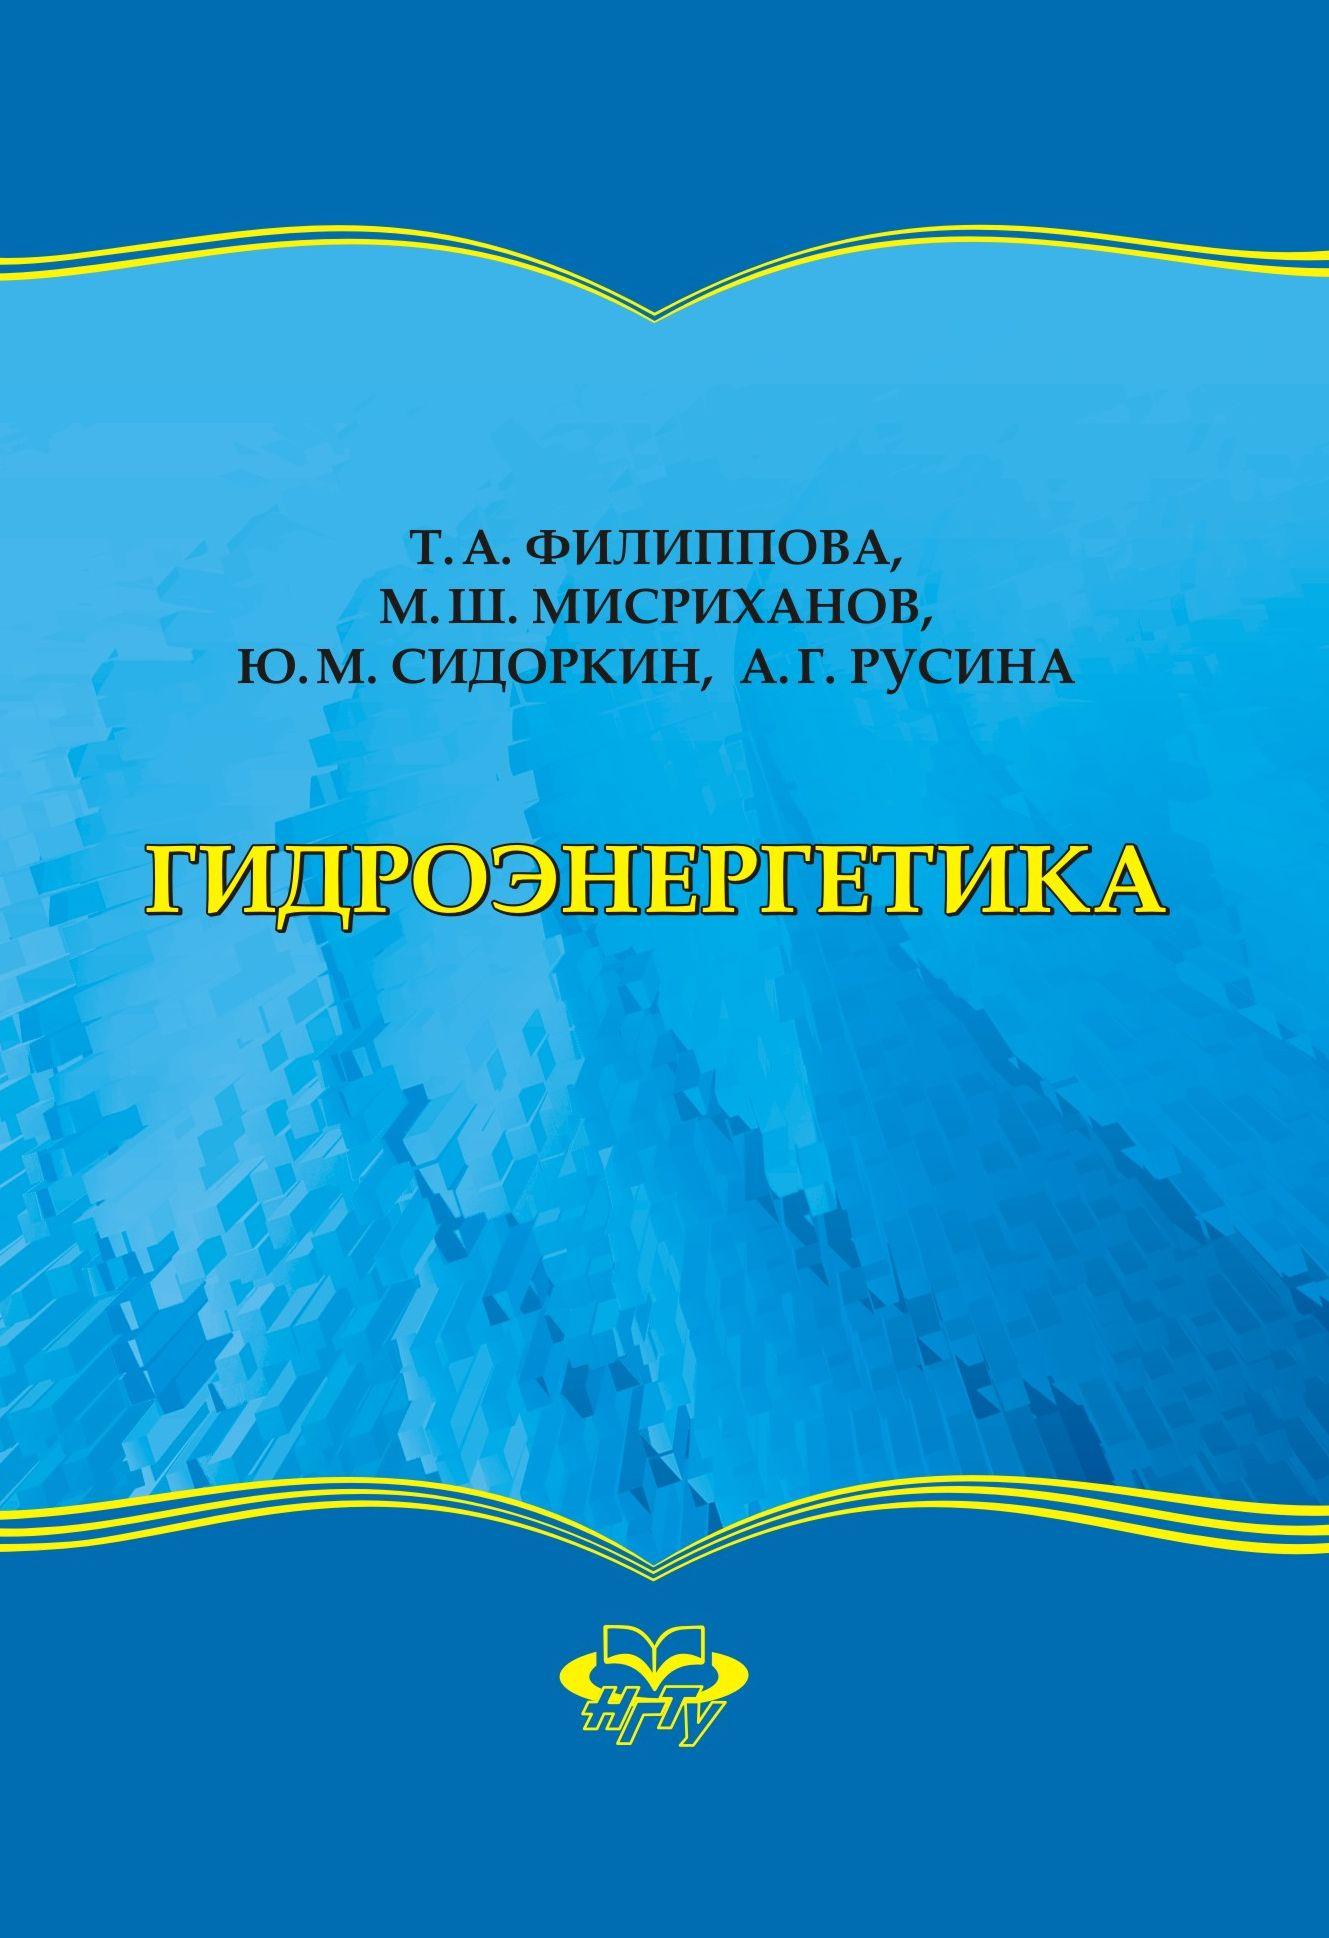 Юрий Михайлович Сидоркин Гидроэнергетика